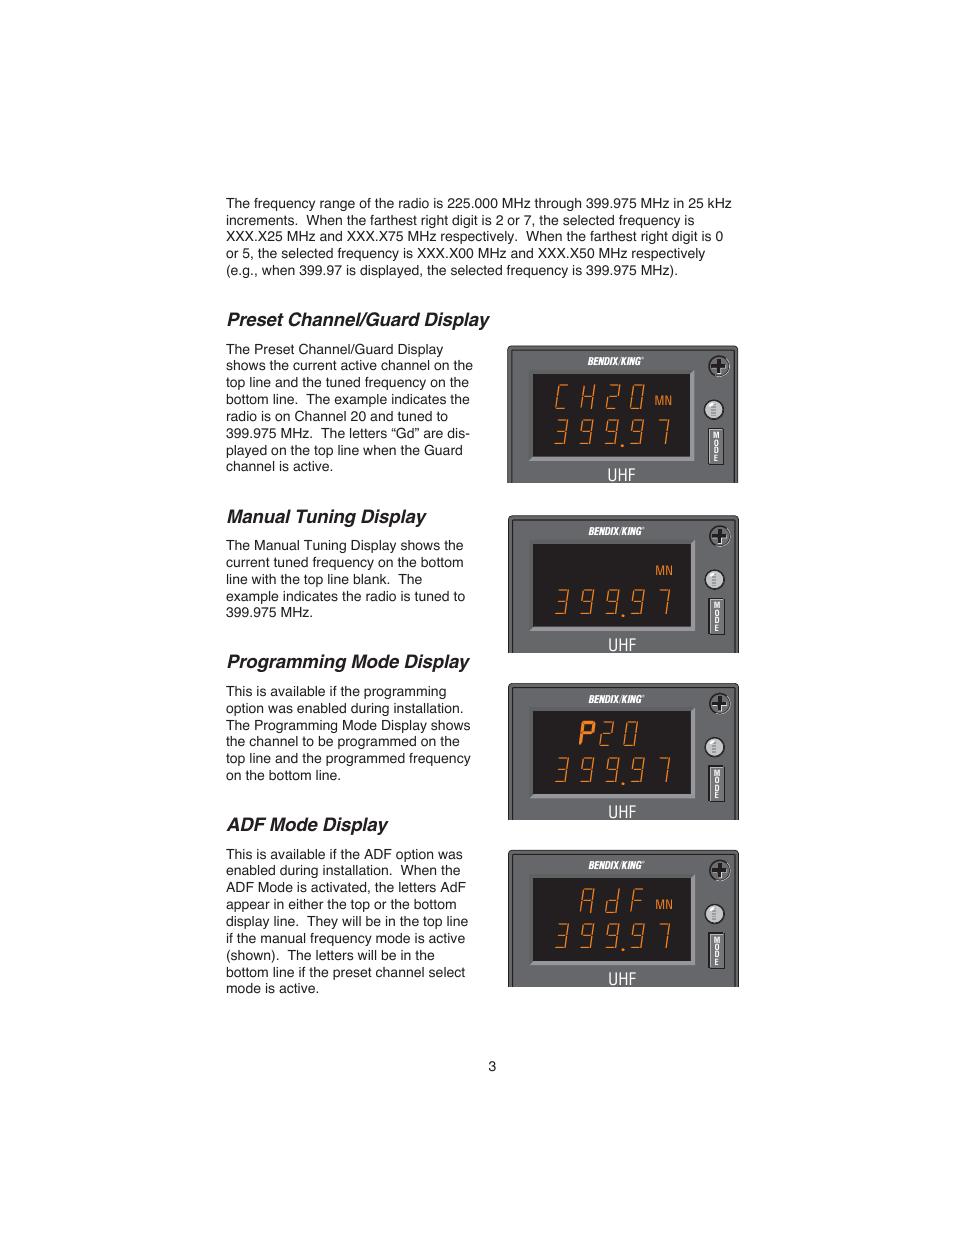 Bendix King Adf Manual Wiring Diagram Bolens G194 Array Preset Channel Guard Display Tuning Programming Rh Manualsdir Com